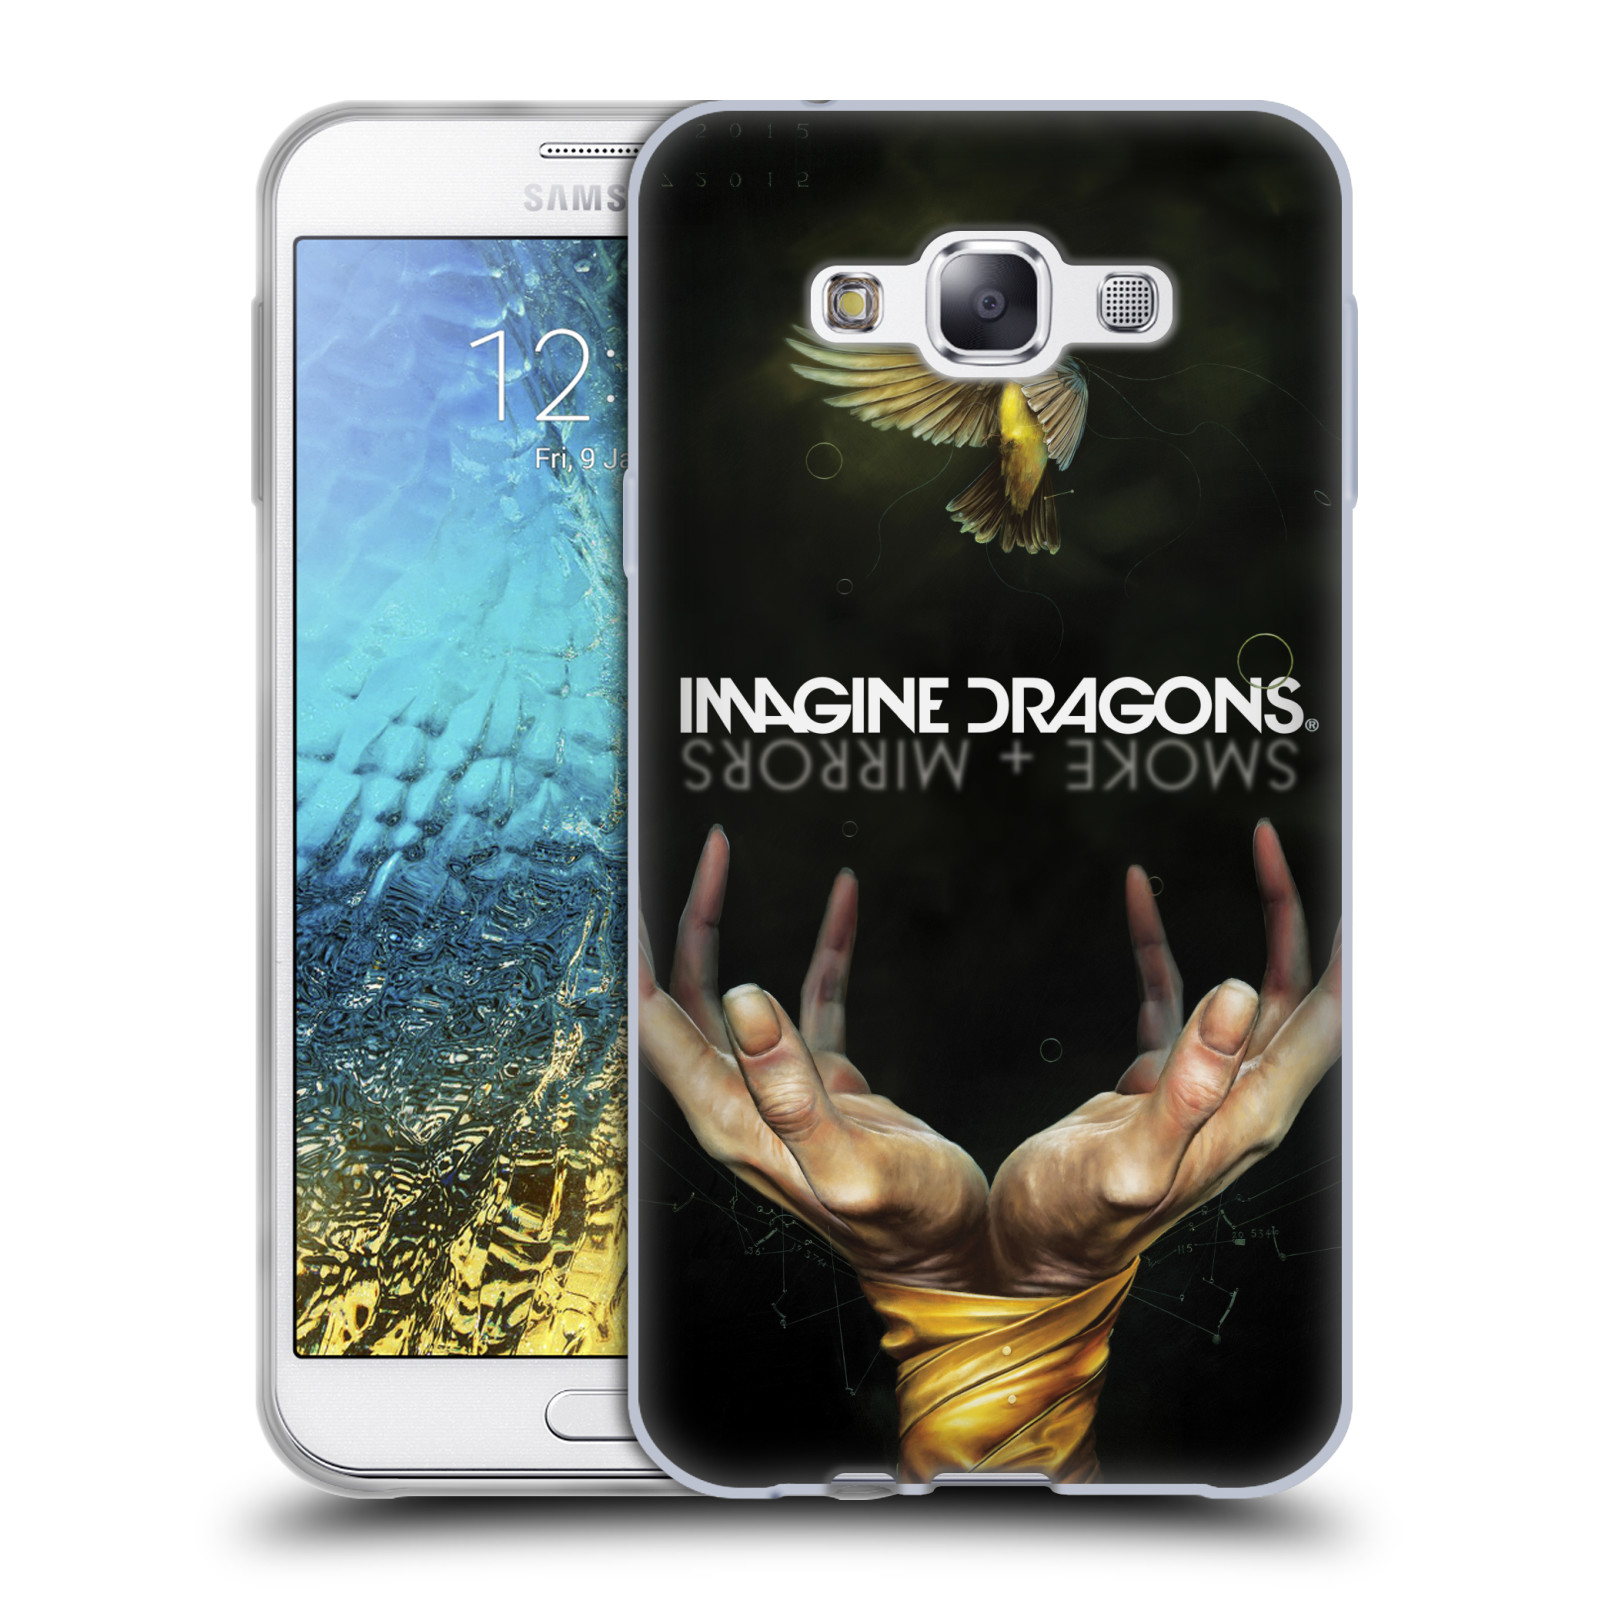 HEAD CASE silikonový obal na mobil Samsung Galaxy E7 hudební skupina Imagine Dragons SMOKE and MIRRORS